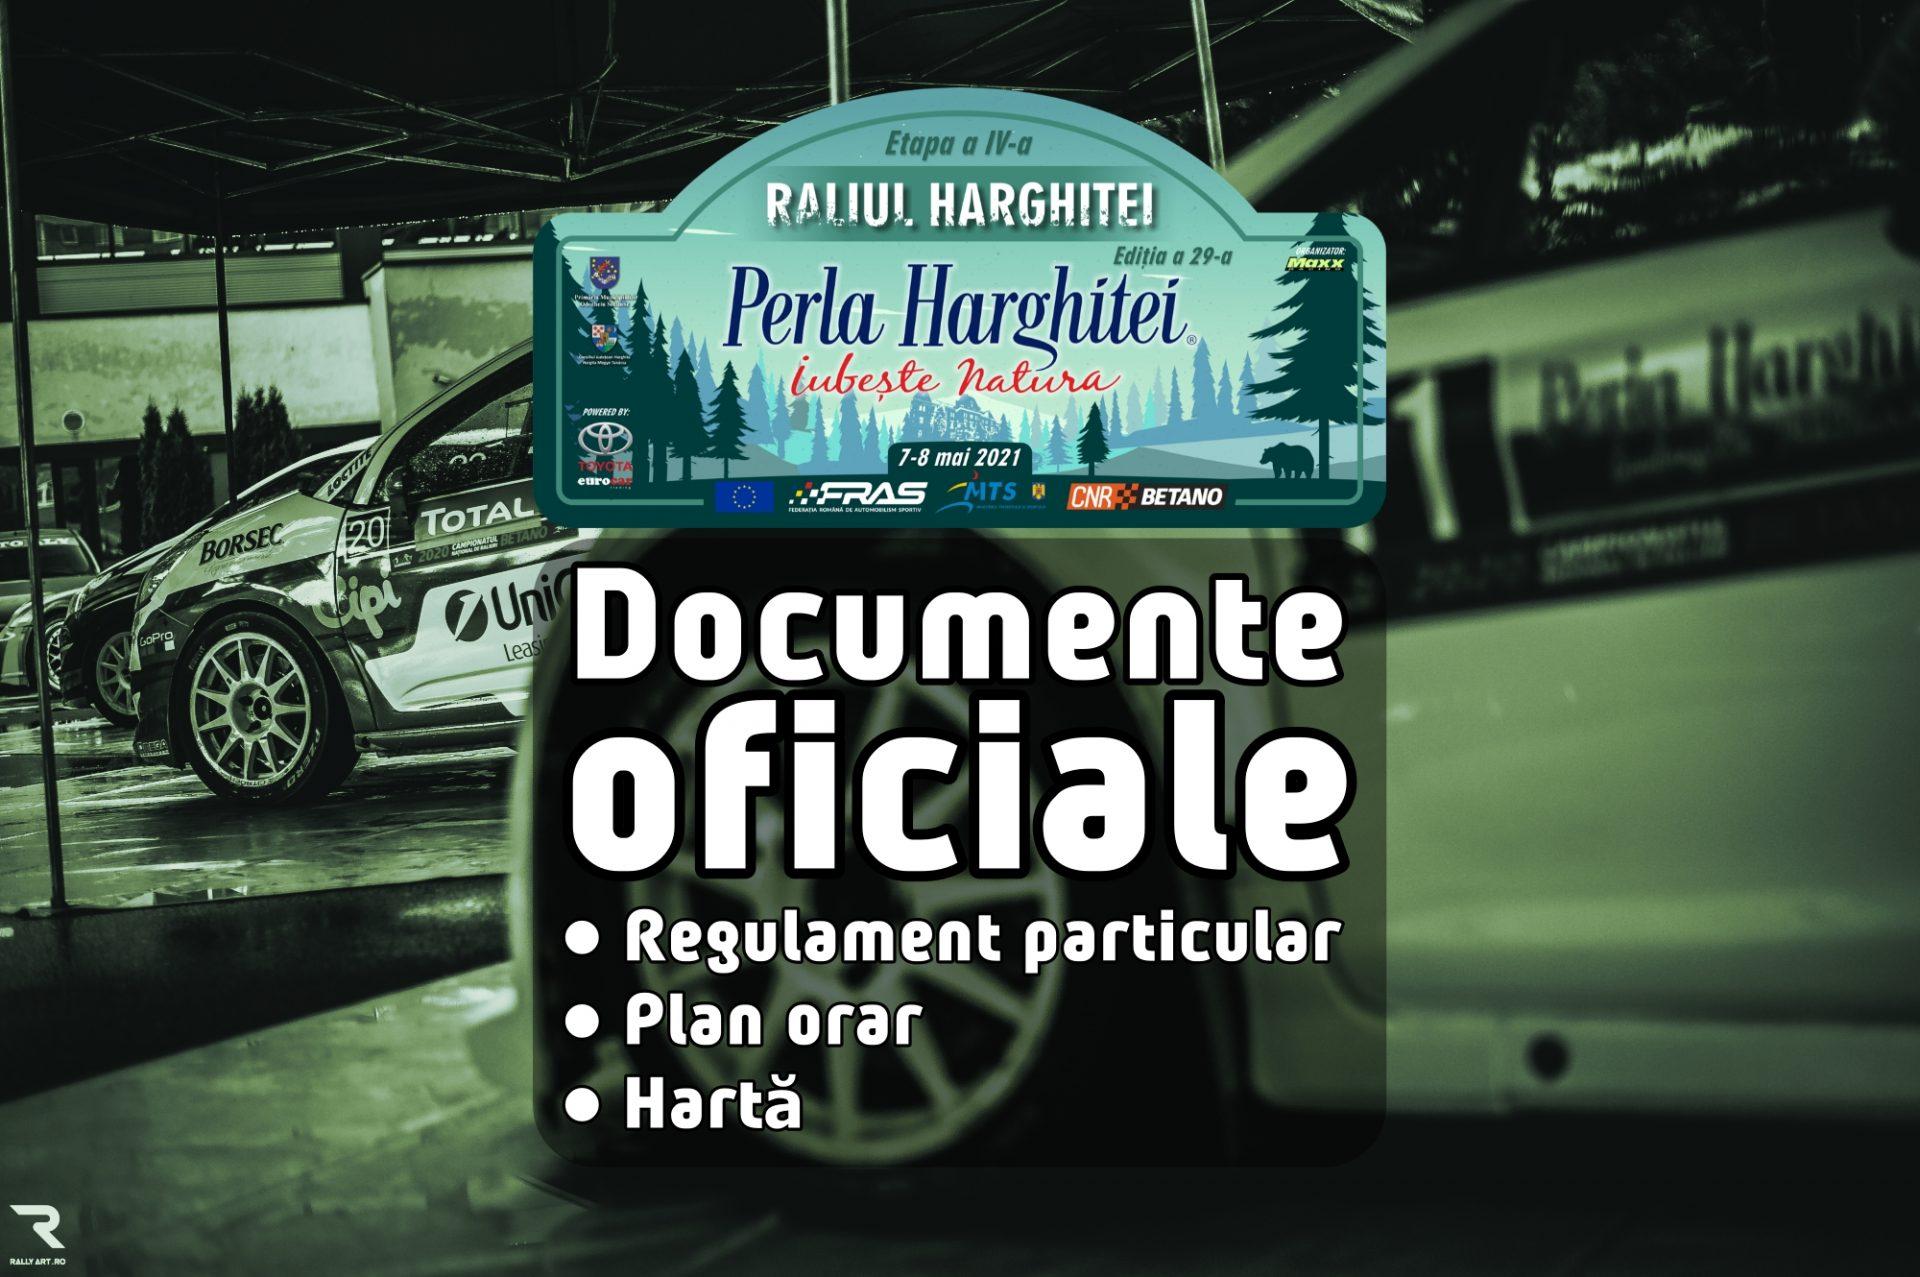 Raliul Perla Harghitei 2021 – Documente oficiale